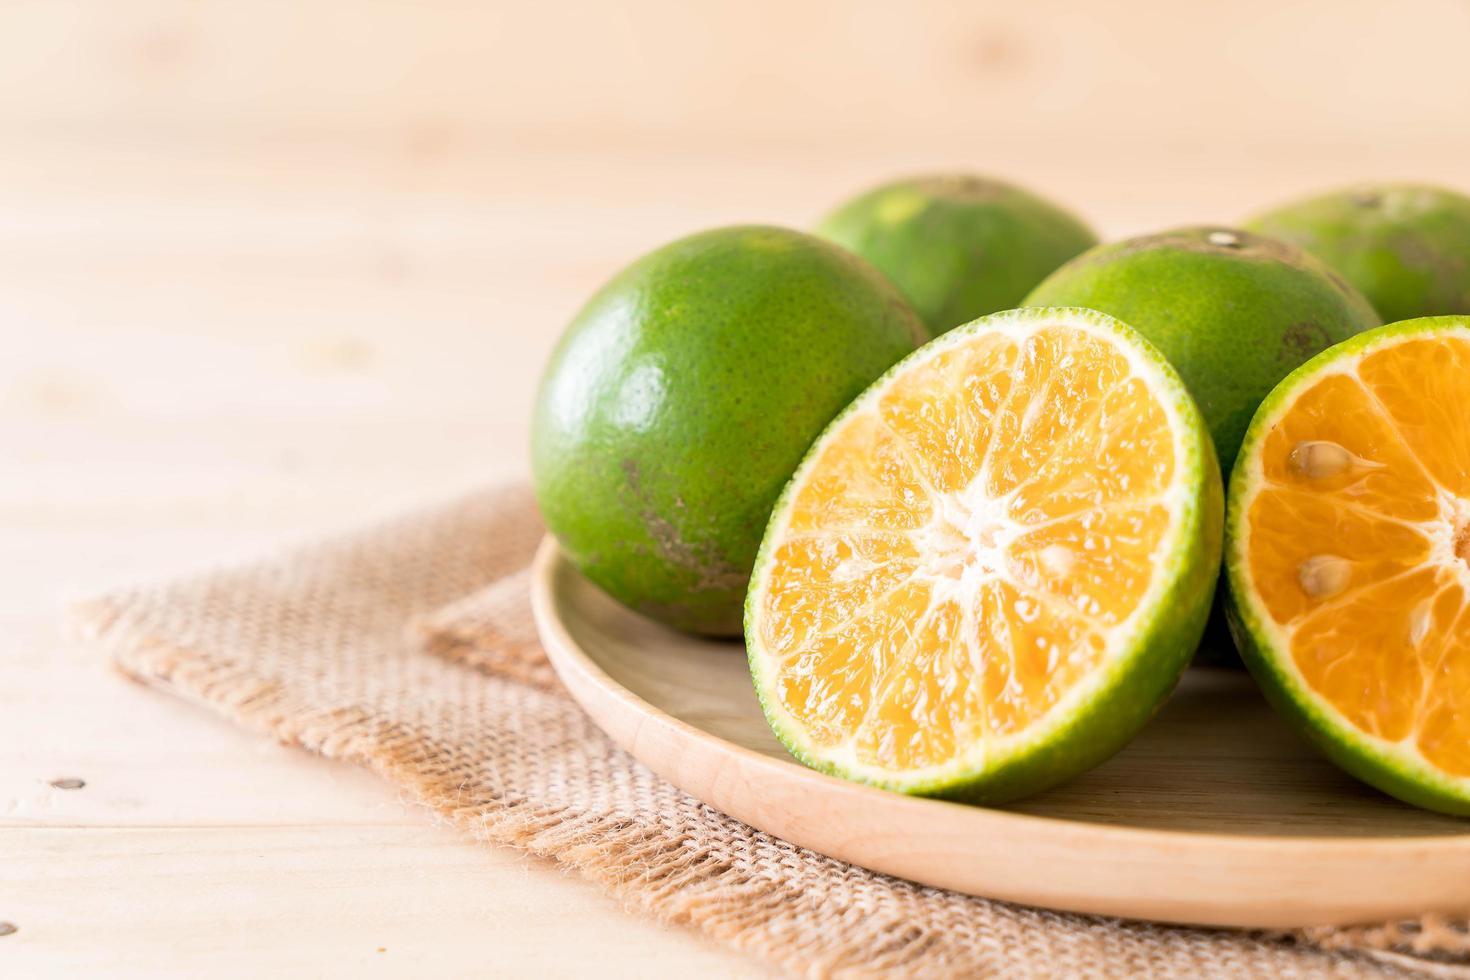 naranjas naturales frescas en placa foto